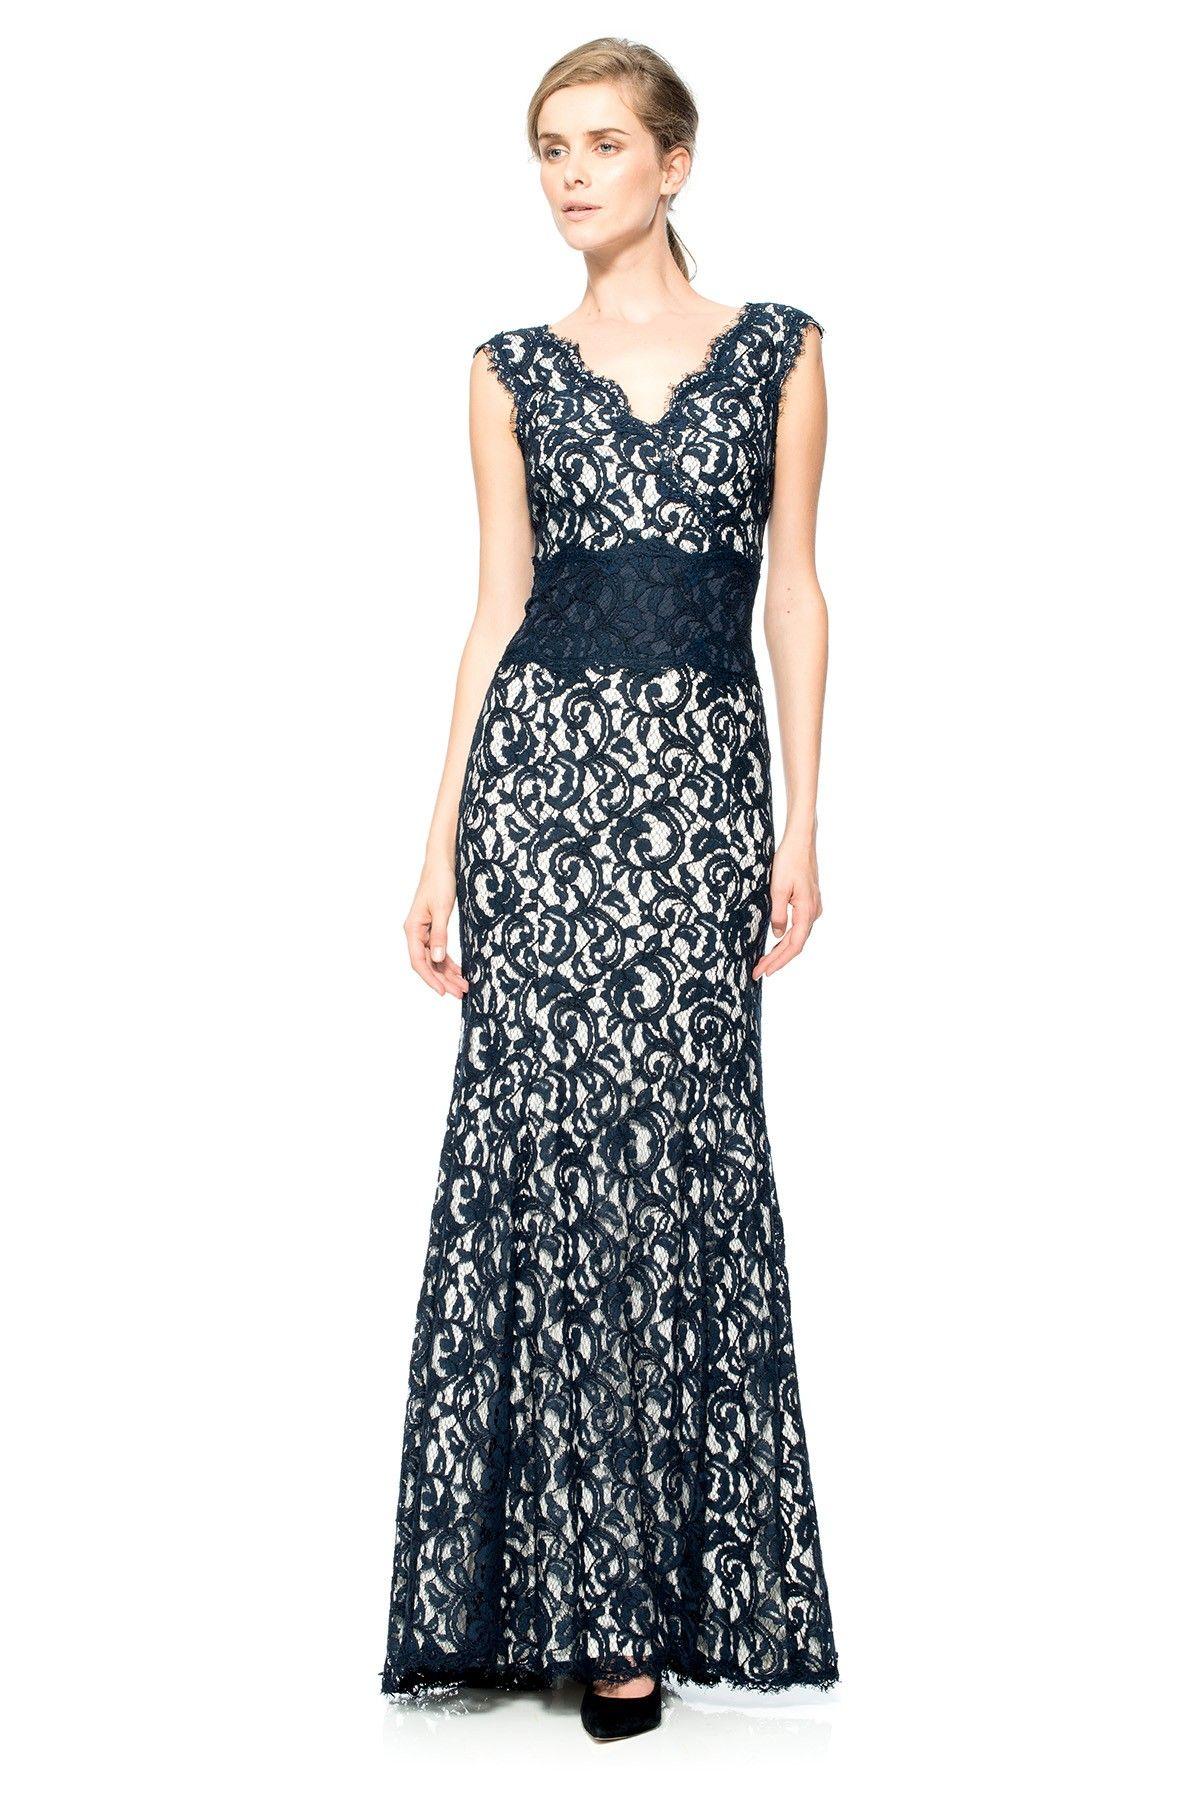 Contrast Lace Waist Gown   Tadashi Shoji   Suze   Pinterest ...